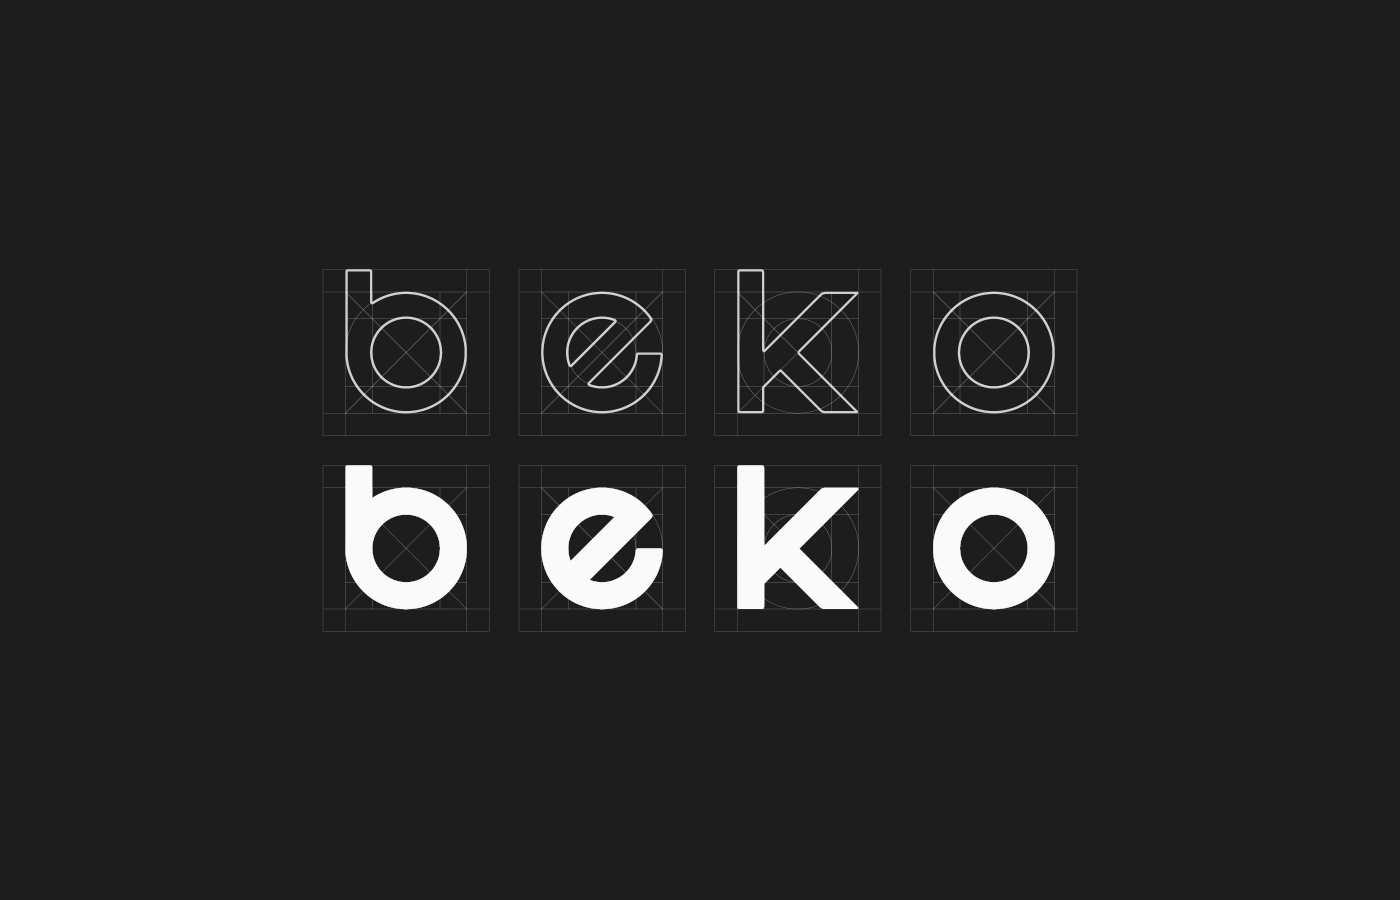 beko redesign logo koç logo Branding design minimal redesign free typeface rebranding visual identity